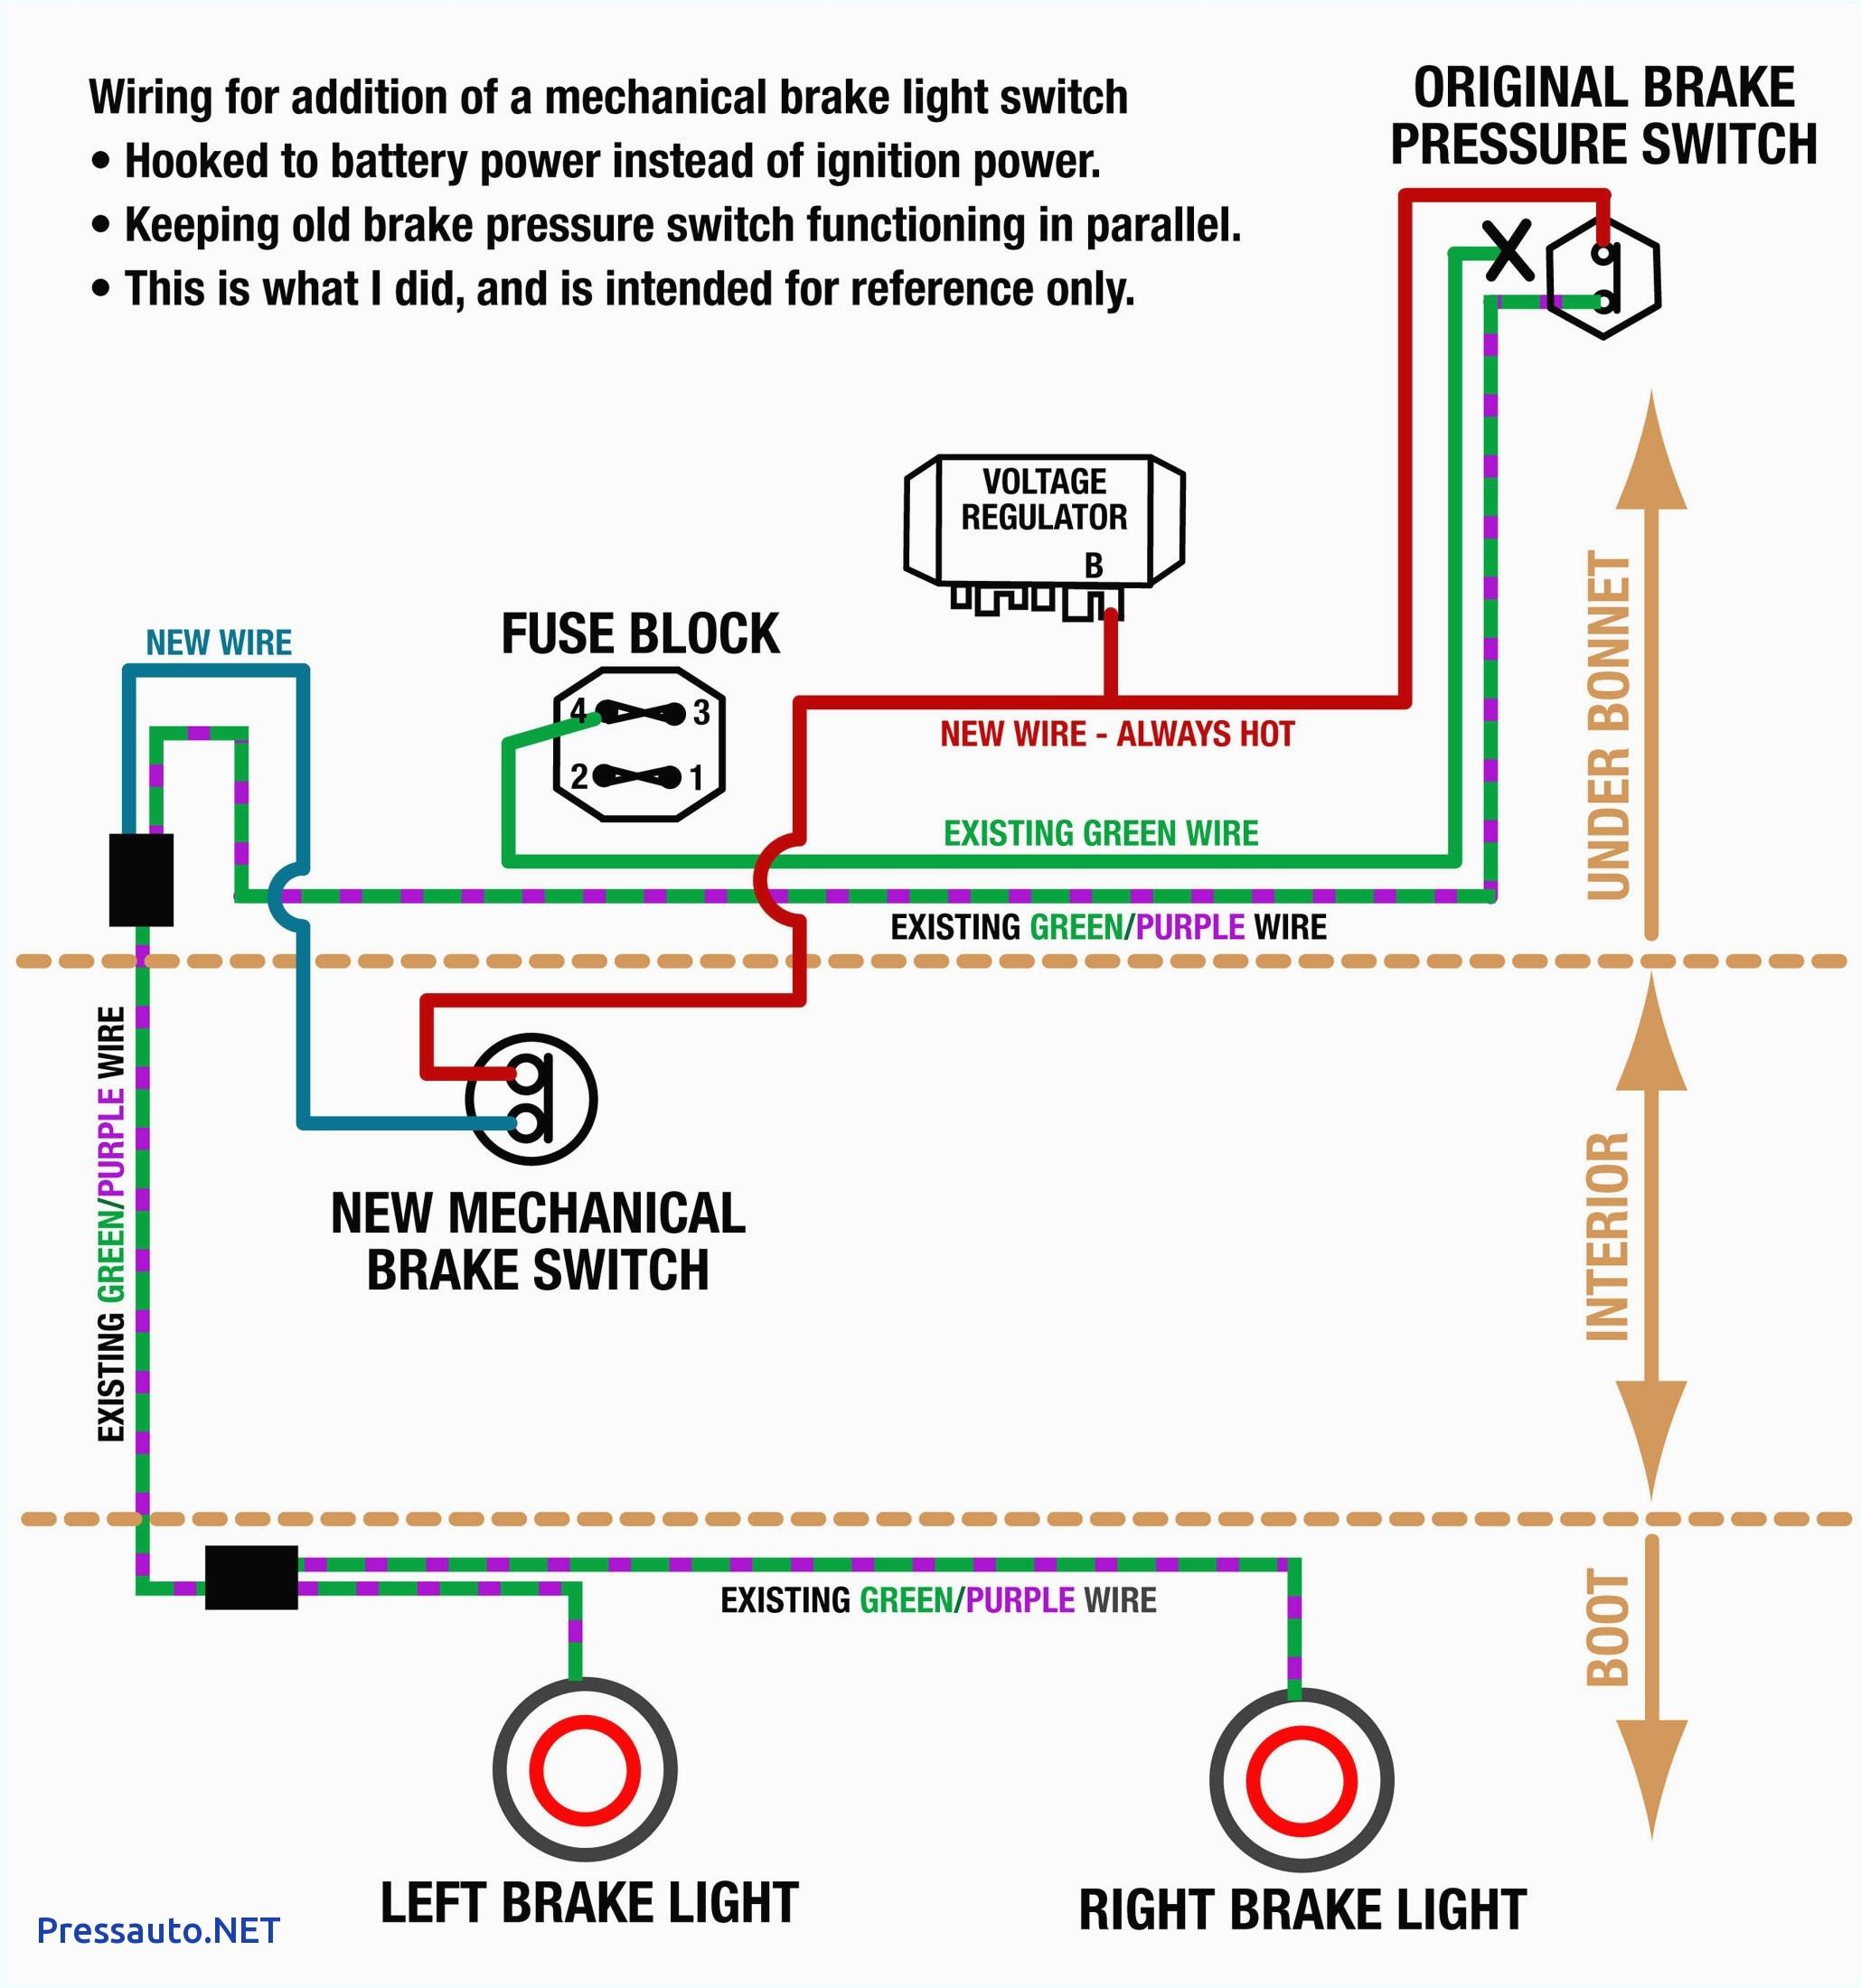 dual xdm280bt wiring diagram best of outstanding big tex dump trailer wiring diagram gallery electrical